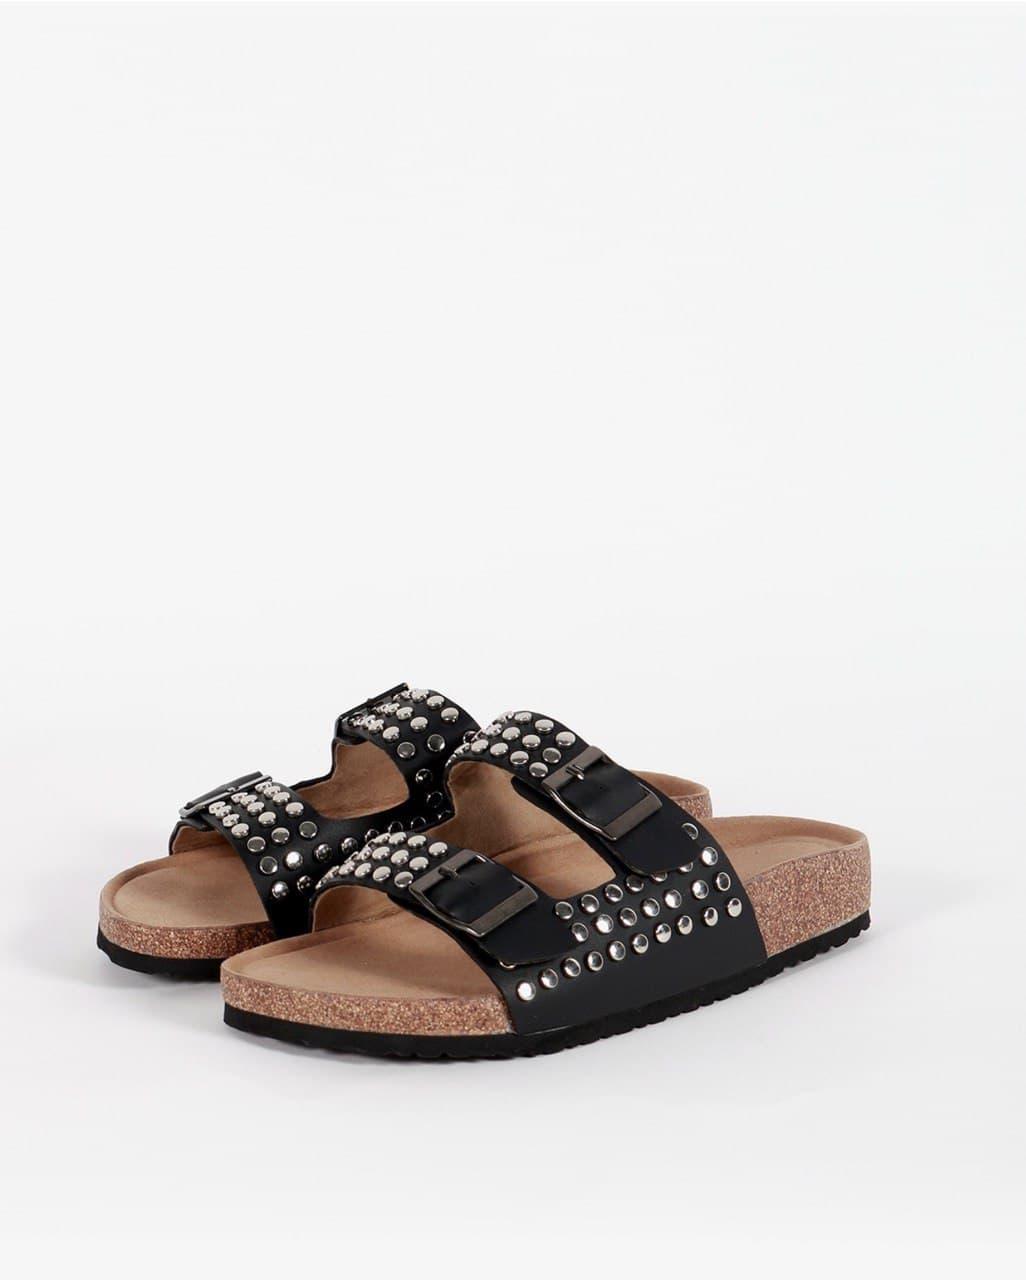 GIO CELLINI | Sandal | ST031NE